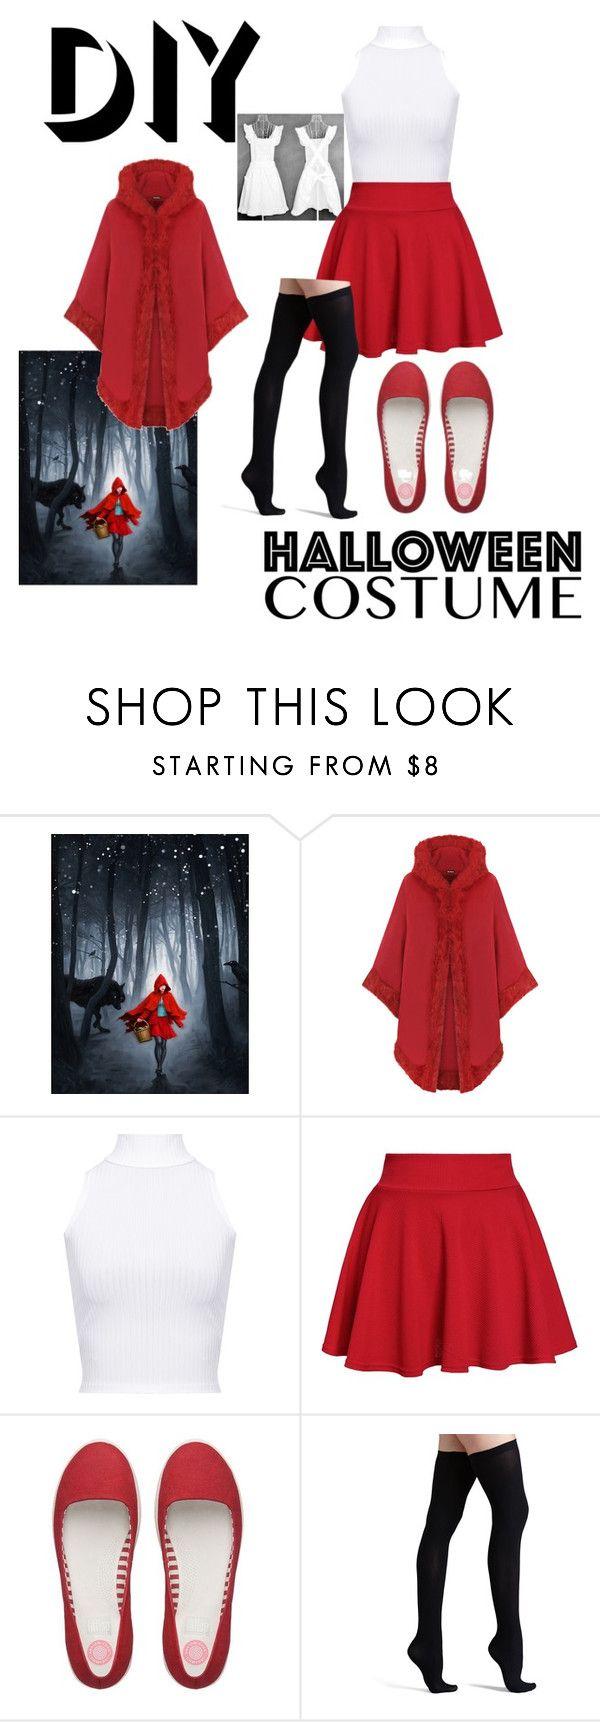 Diy little red riding hood costume | Halloween | Halloween